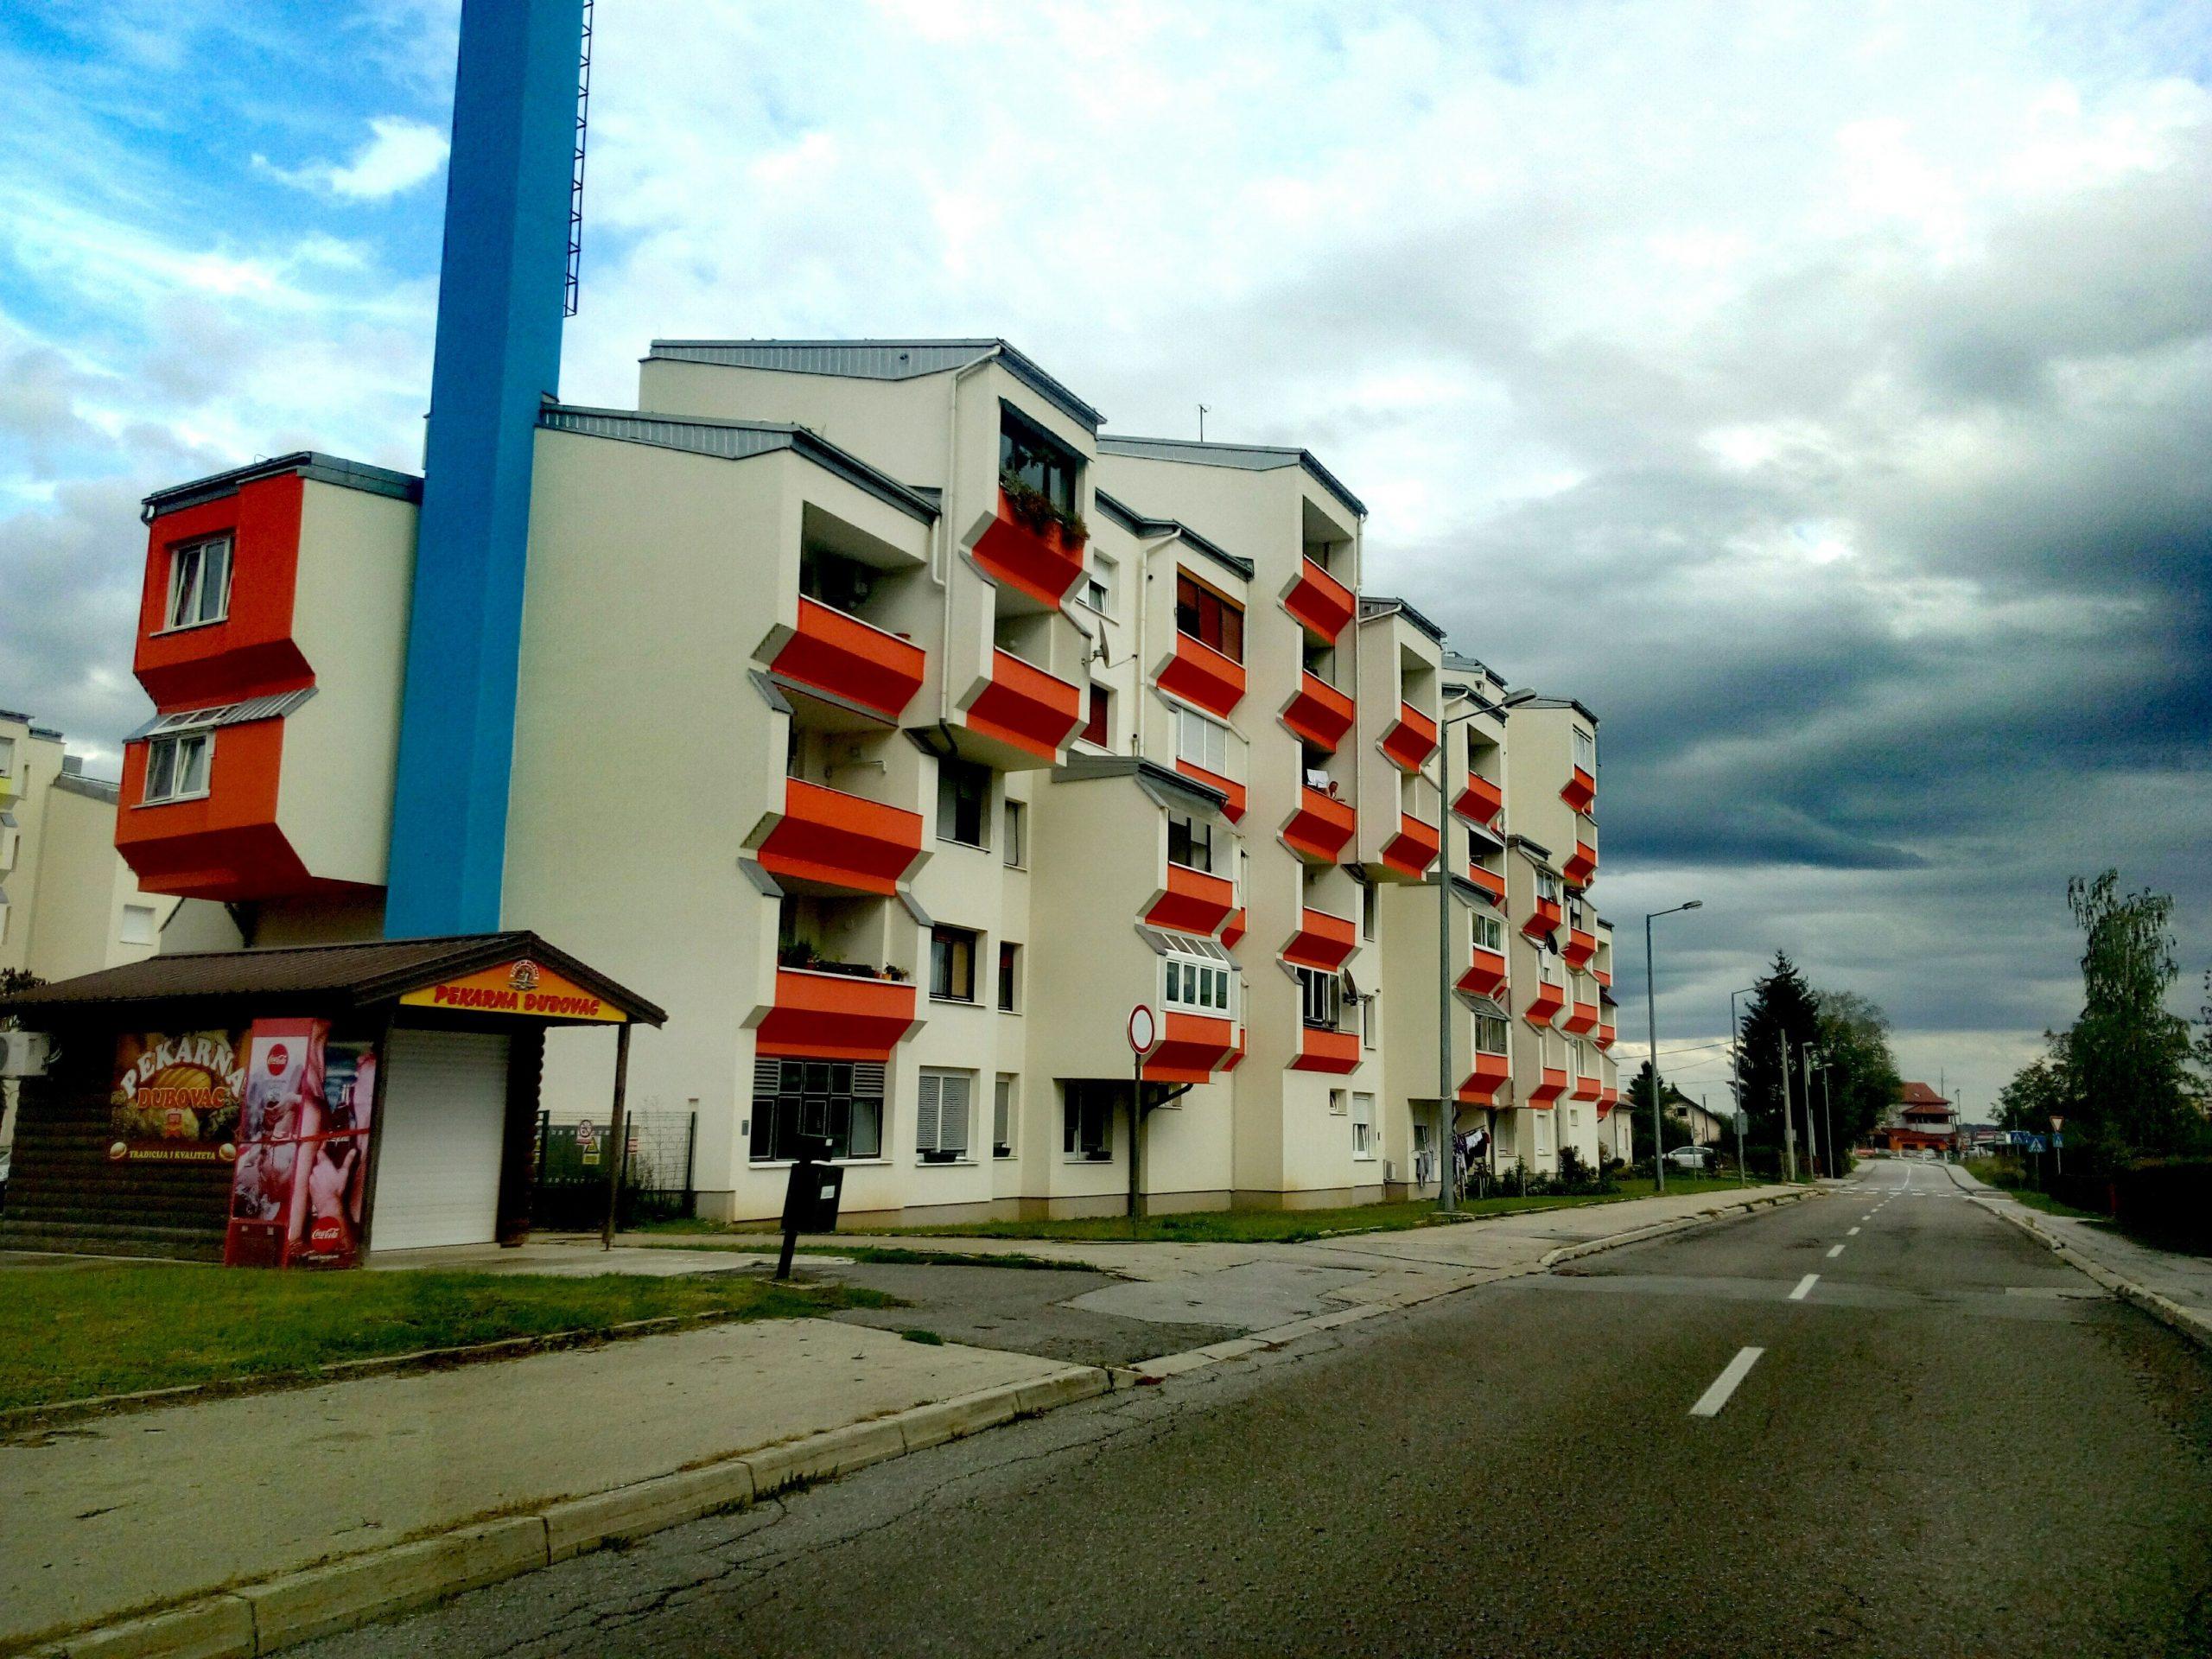 Energetska obnova stambenog niza u Karlovcu, Baščinska cesta 37a-b, 39a-d i 41a-c